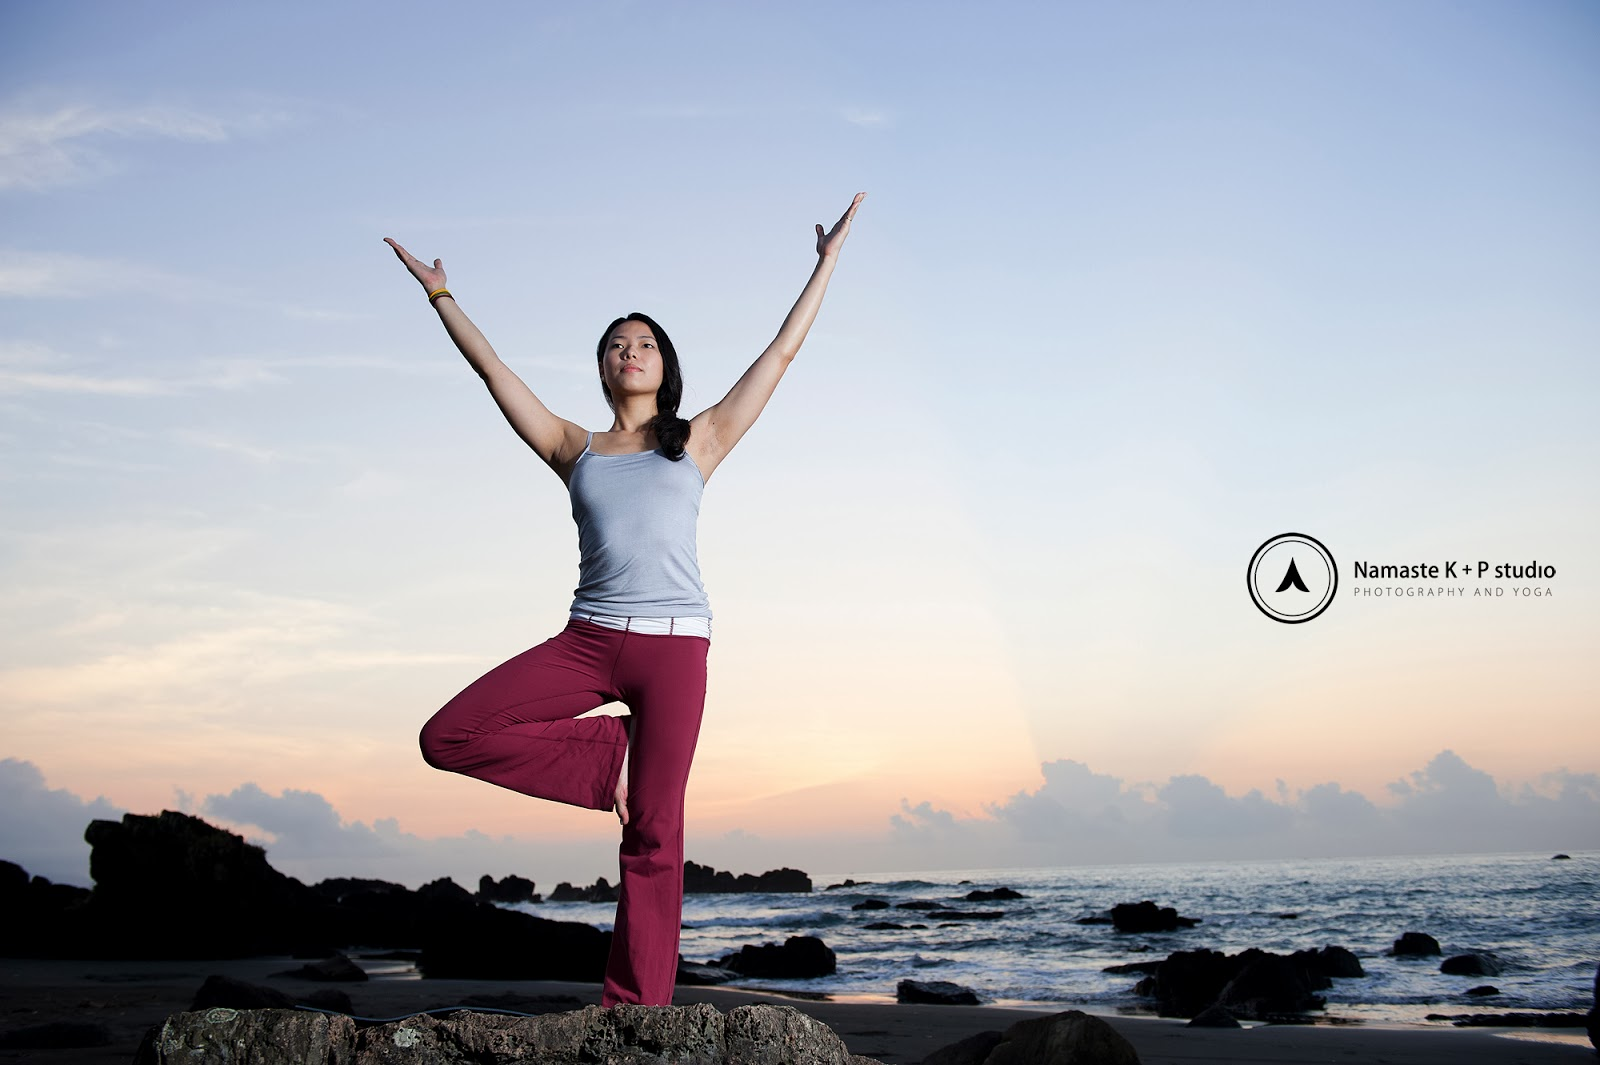 Namaste K+P studio: Yoga ~ Vritchasana 樹式